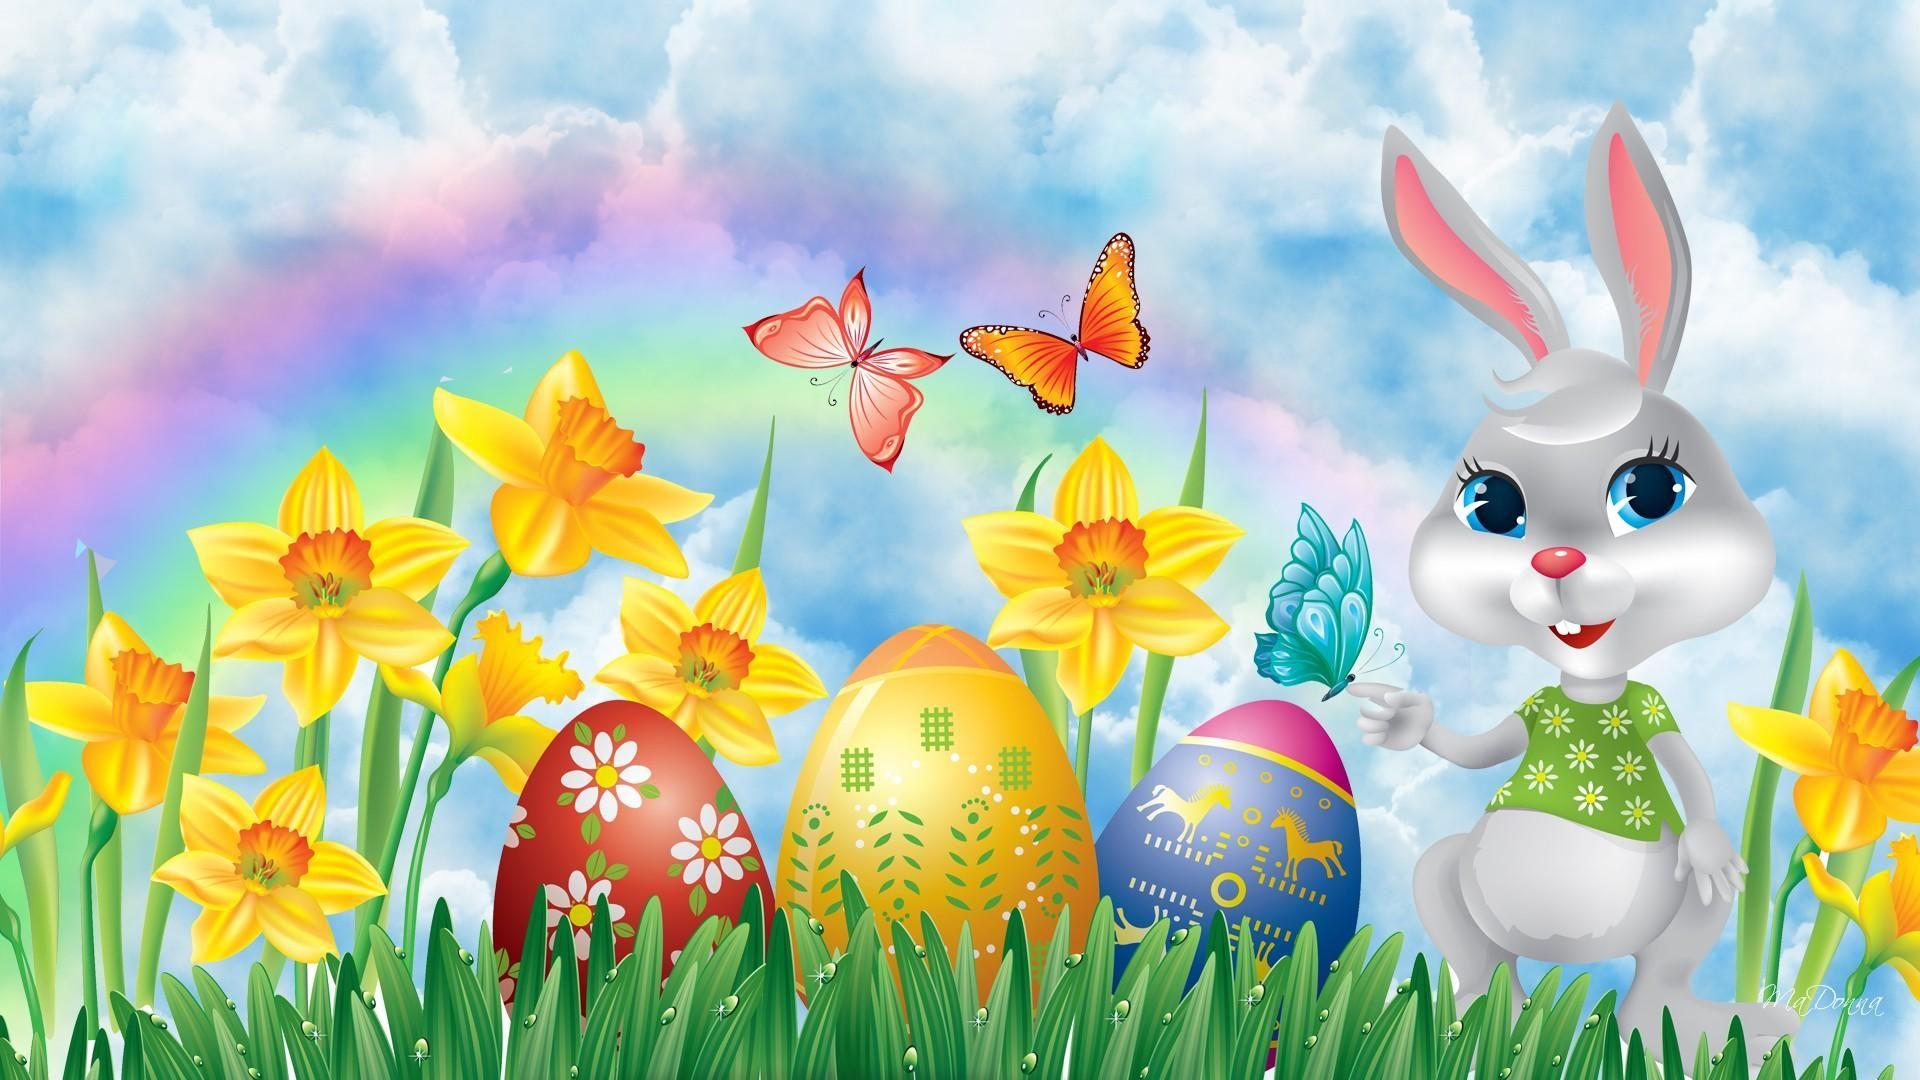 Hd wallpaper easter - Easter Wallpapers For Desktop Happy Easter Hd Wallpaper High Definition